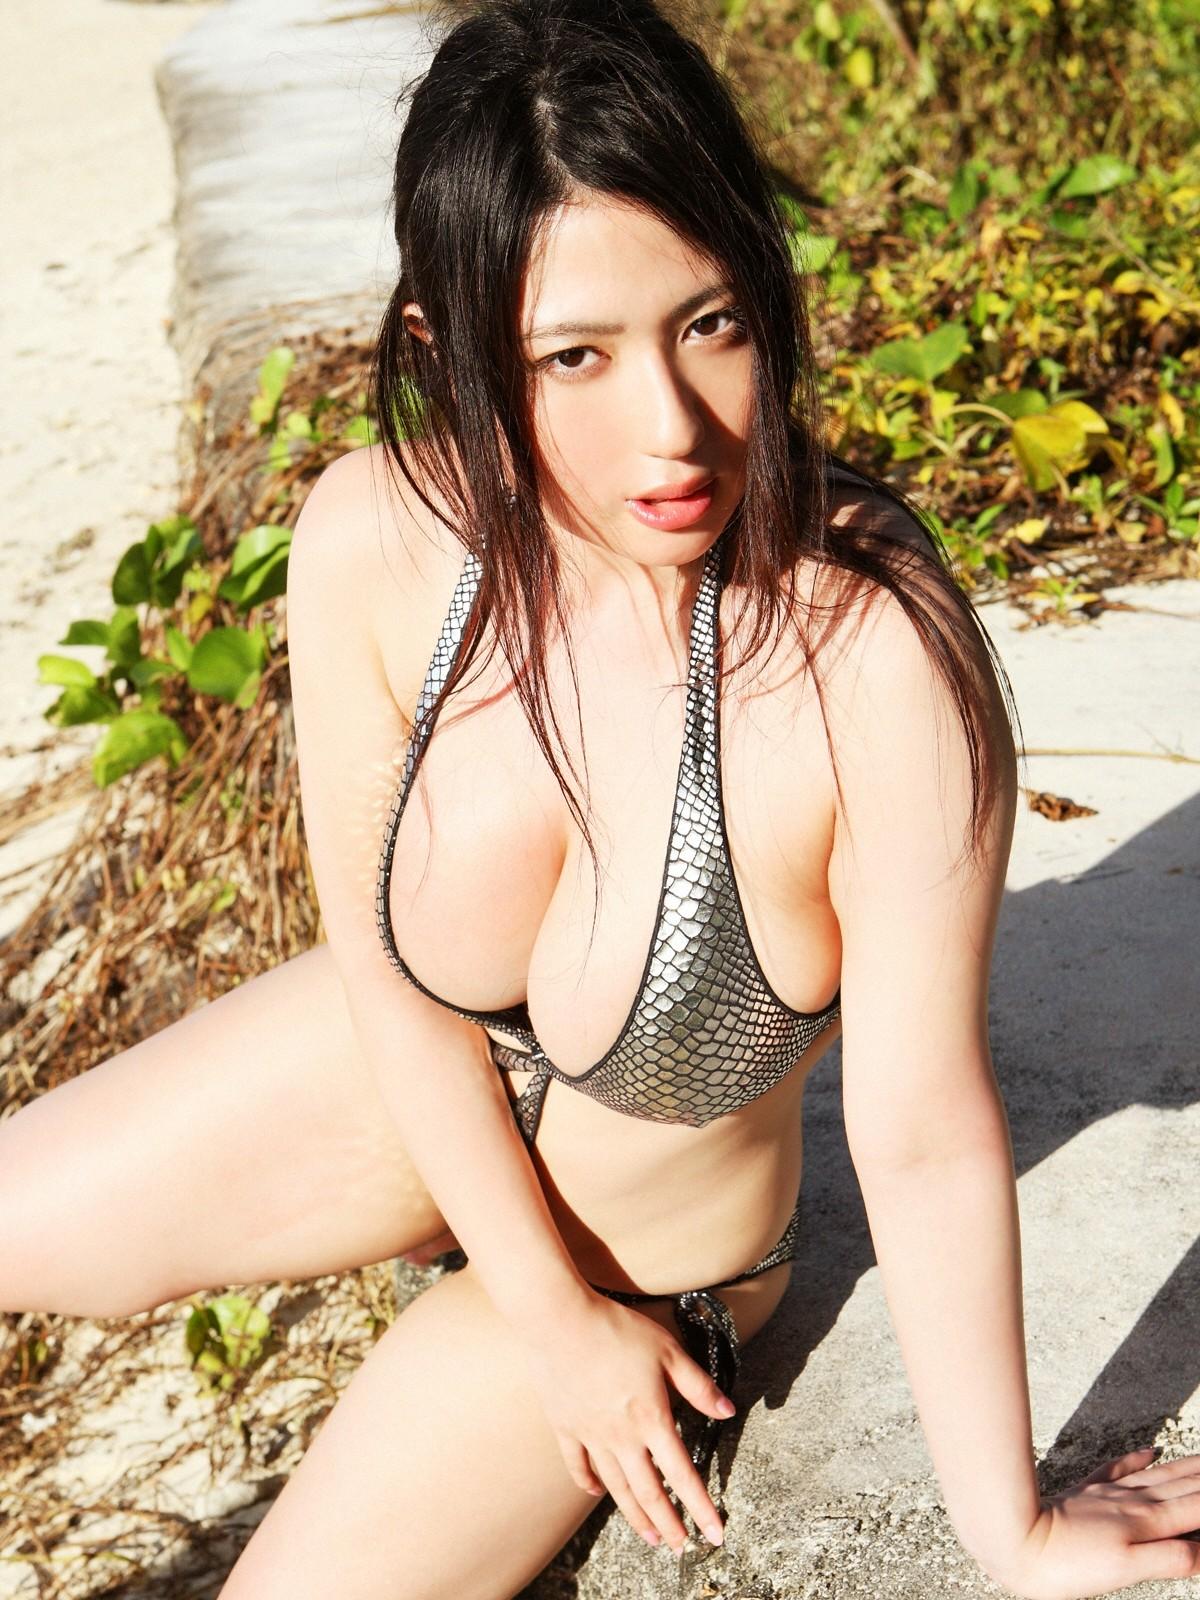 Simply nonami takizawa model